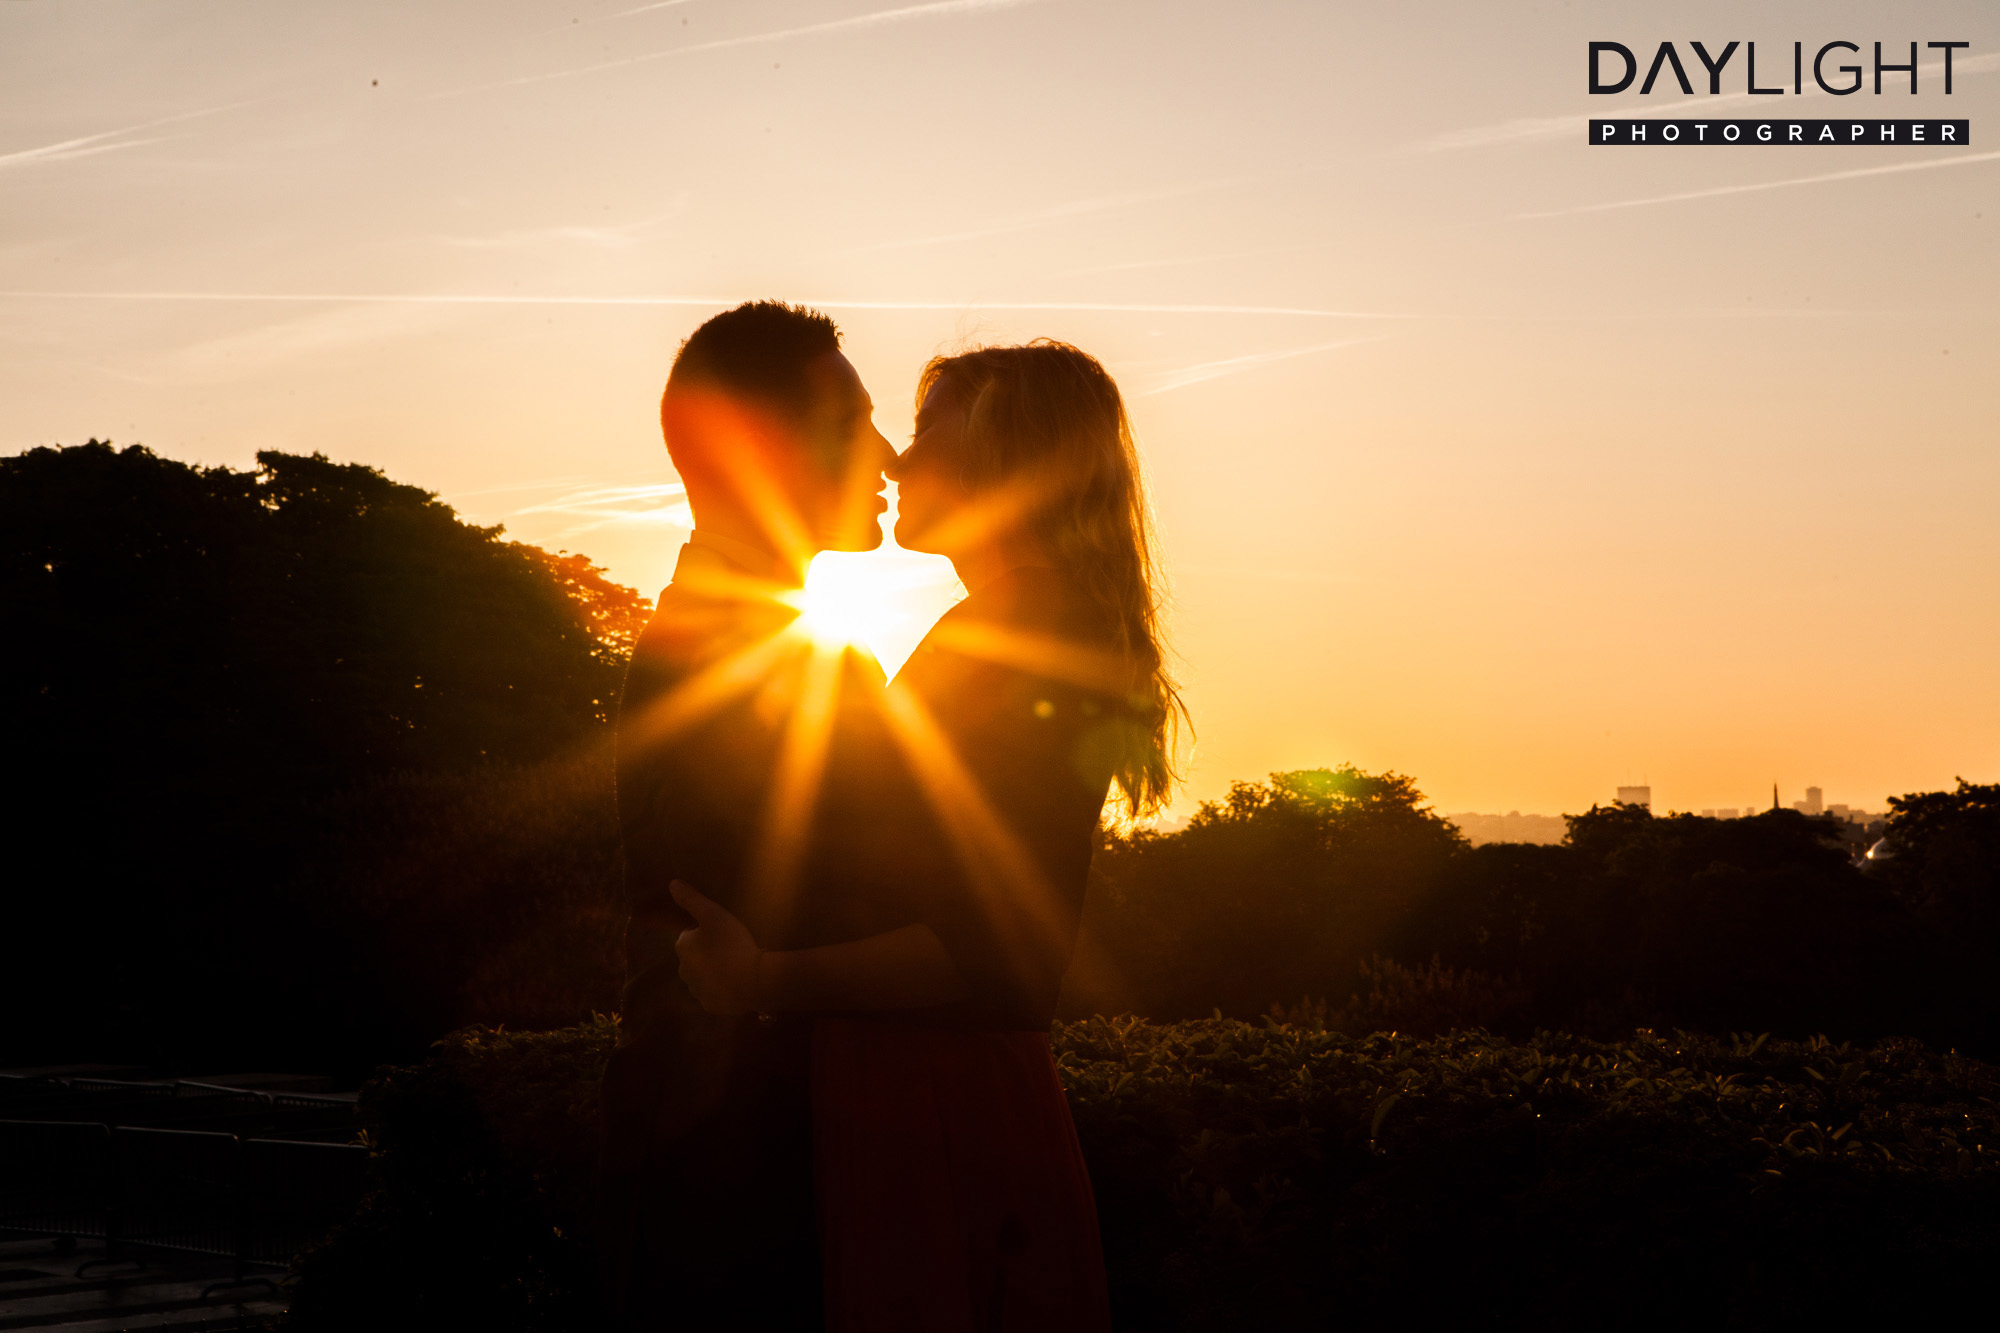 Kuss Romantisch In Paris Daylightphotographer